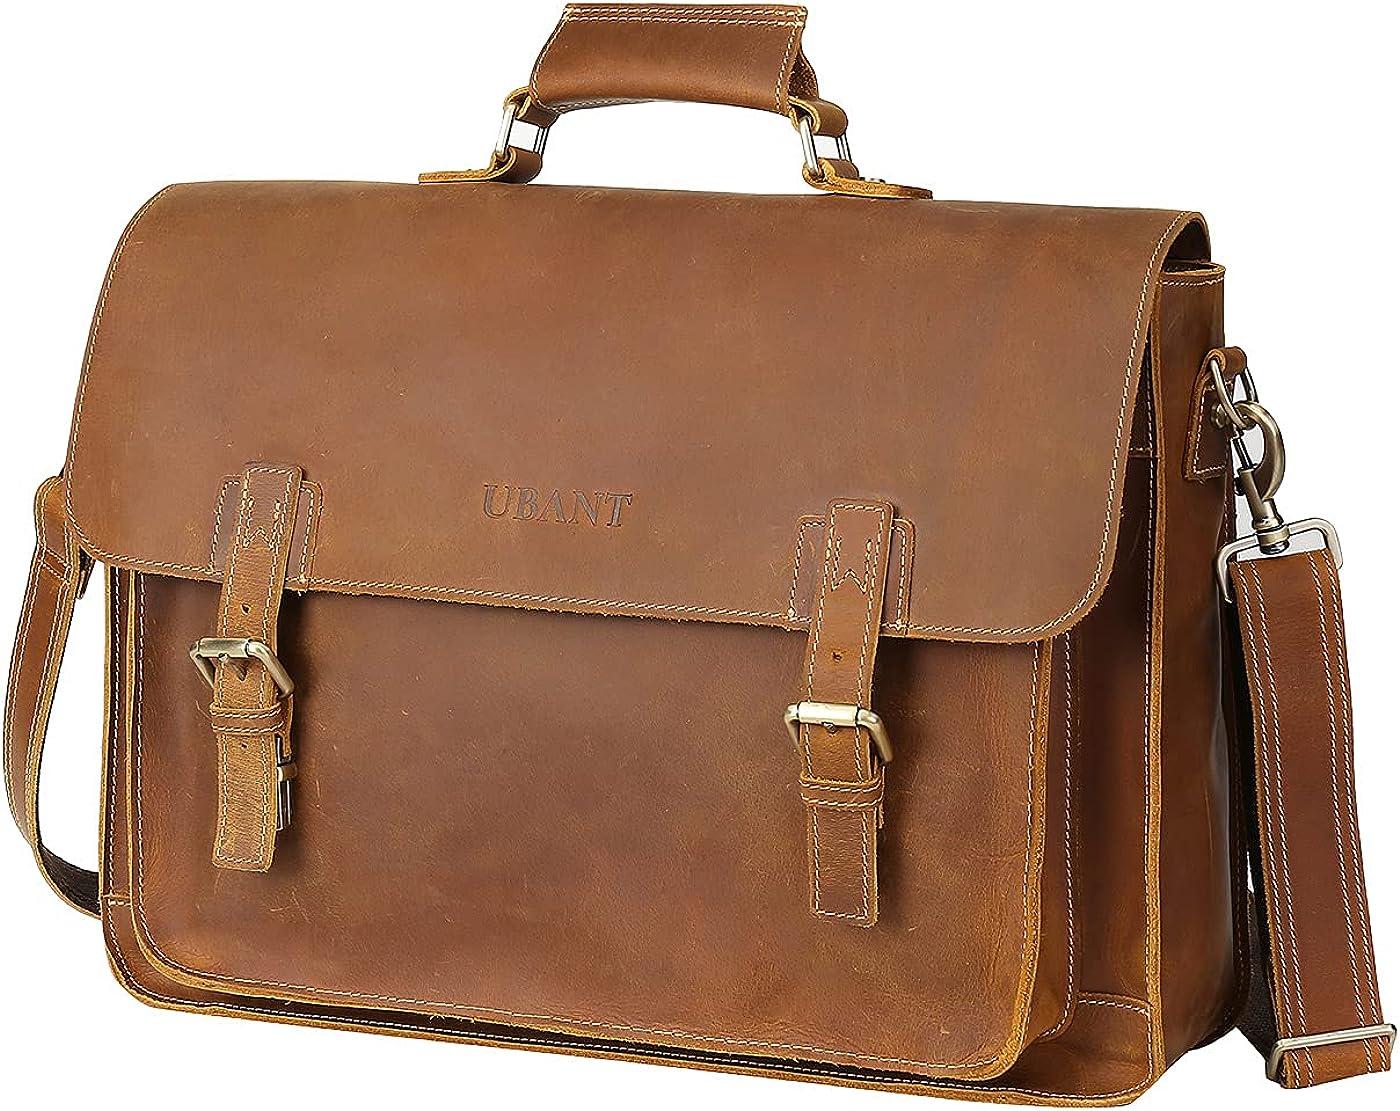 UBANT 5 ☆ very popular Leather Messenger Bag for New color Men Inch 17.3 Laptop F Briefcase